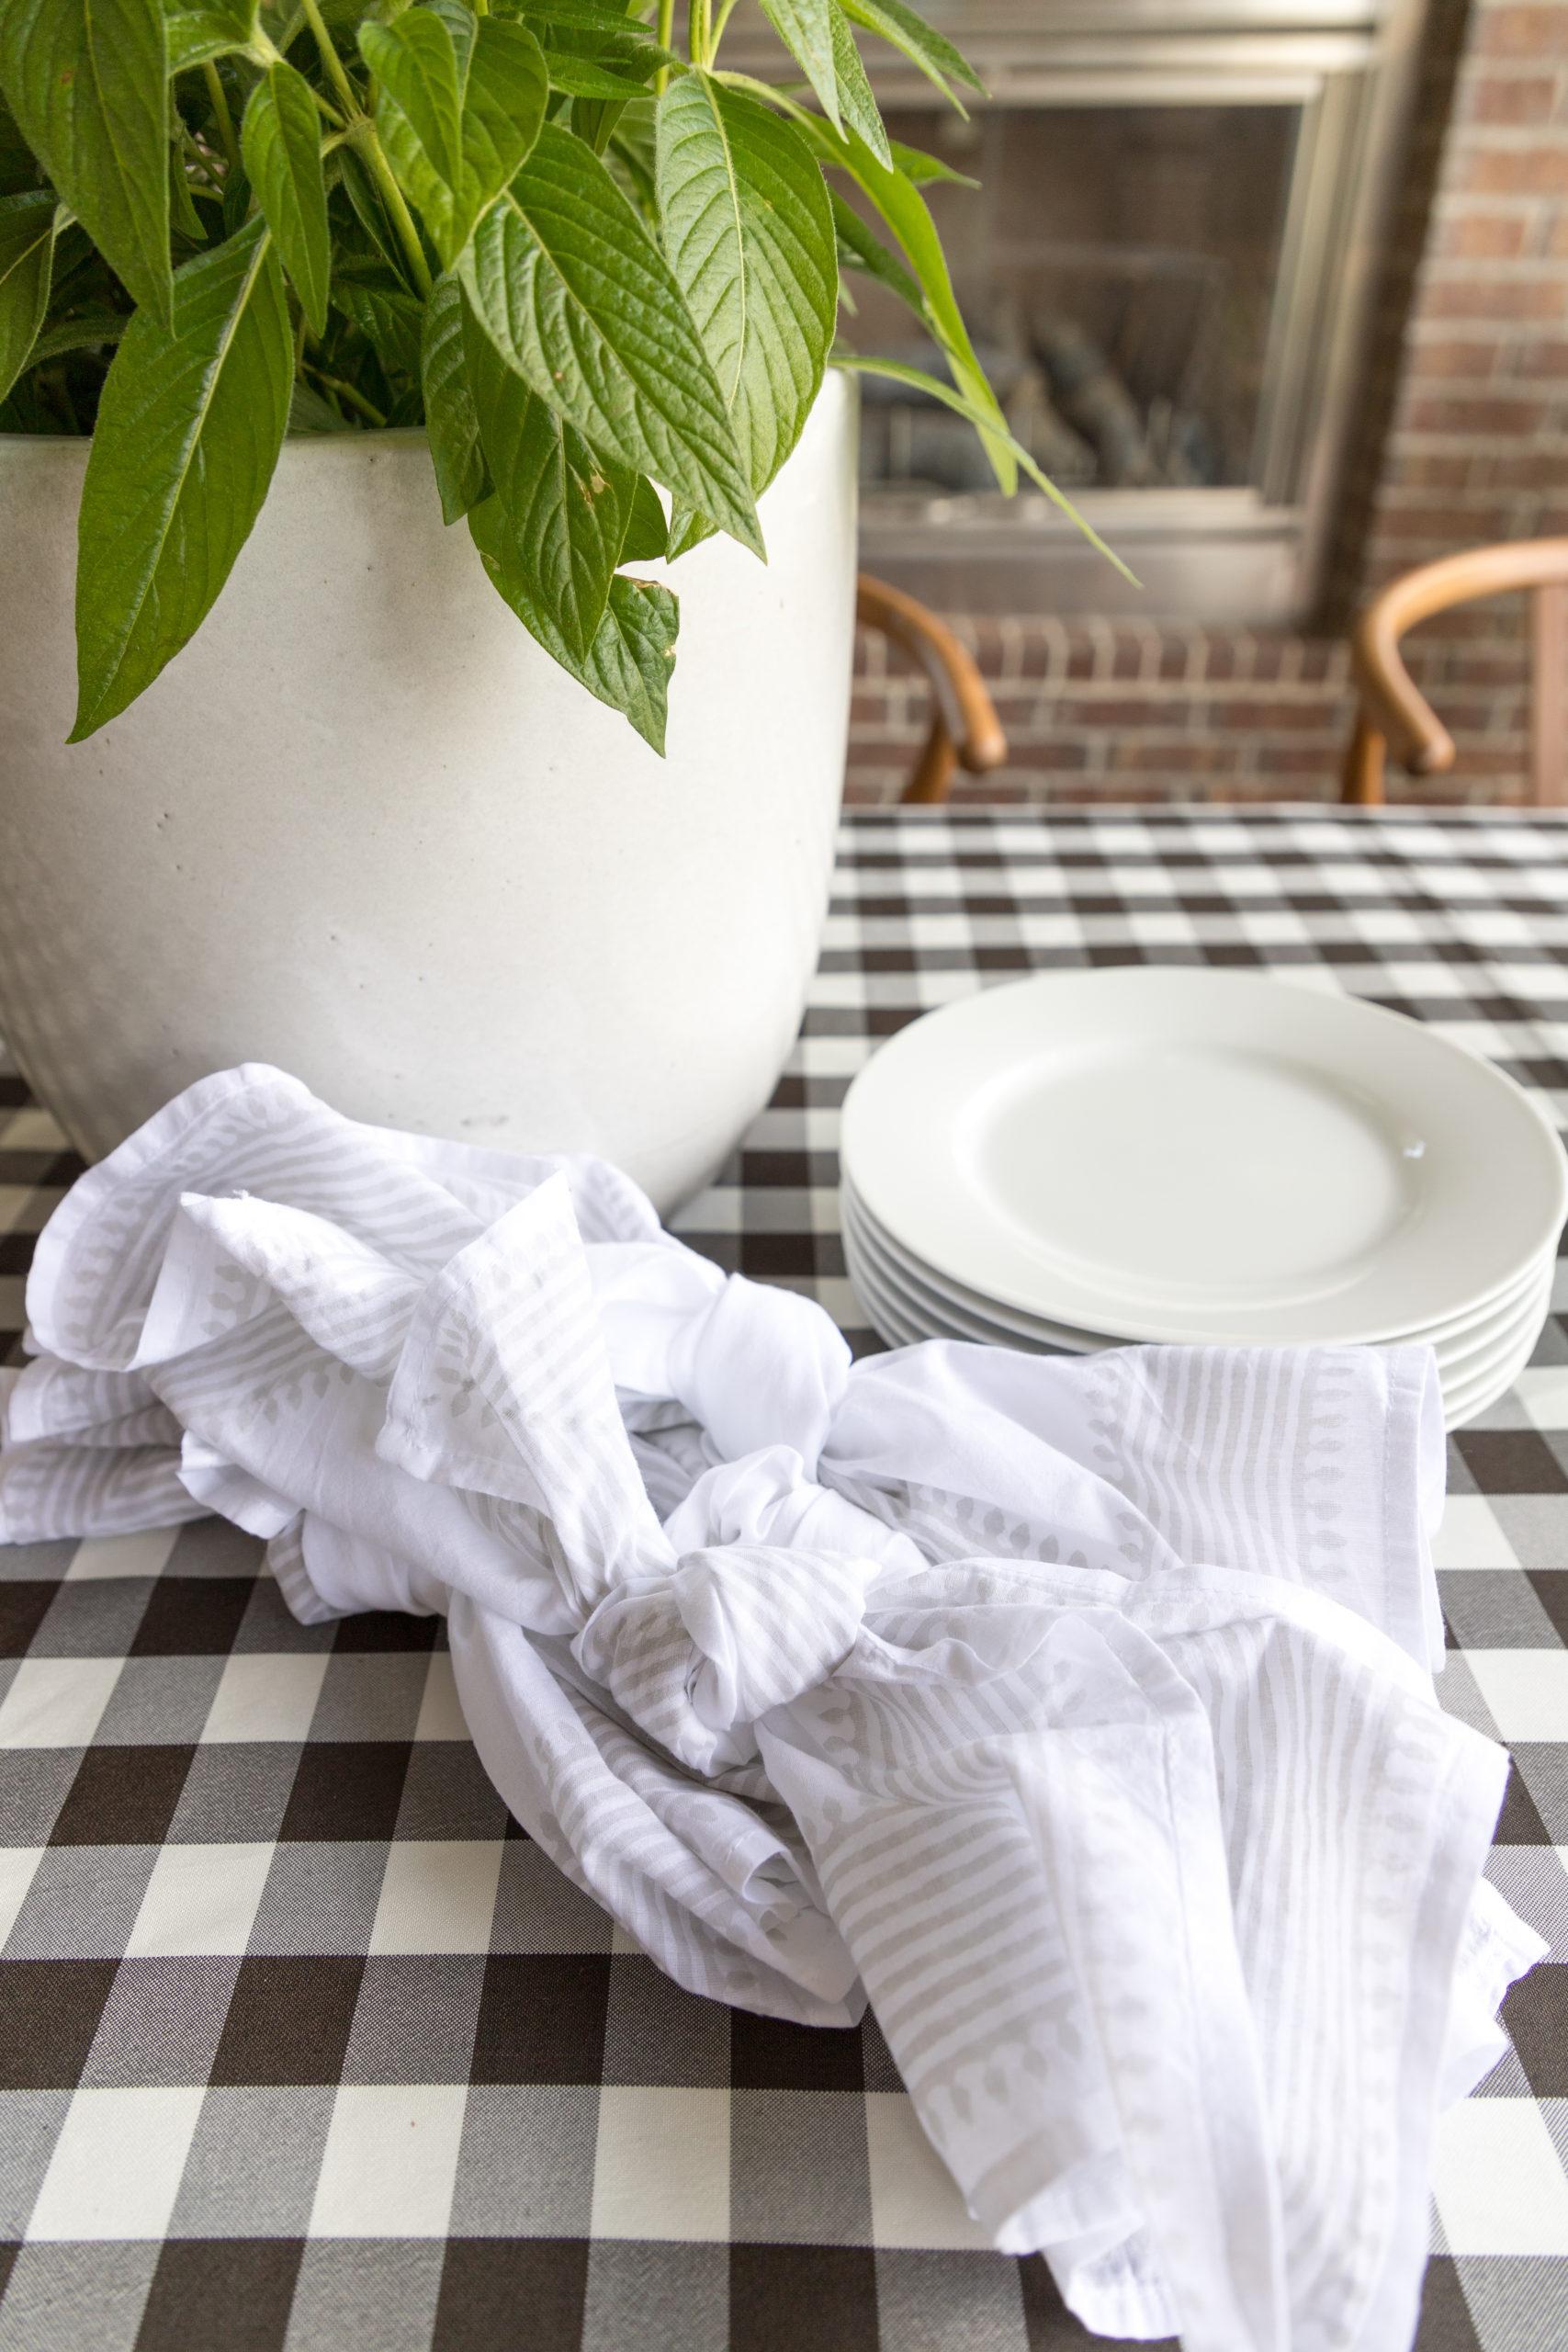 Serena & Lily Brela napkins, knotted napkins